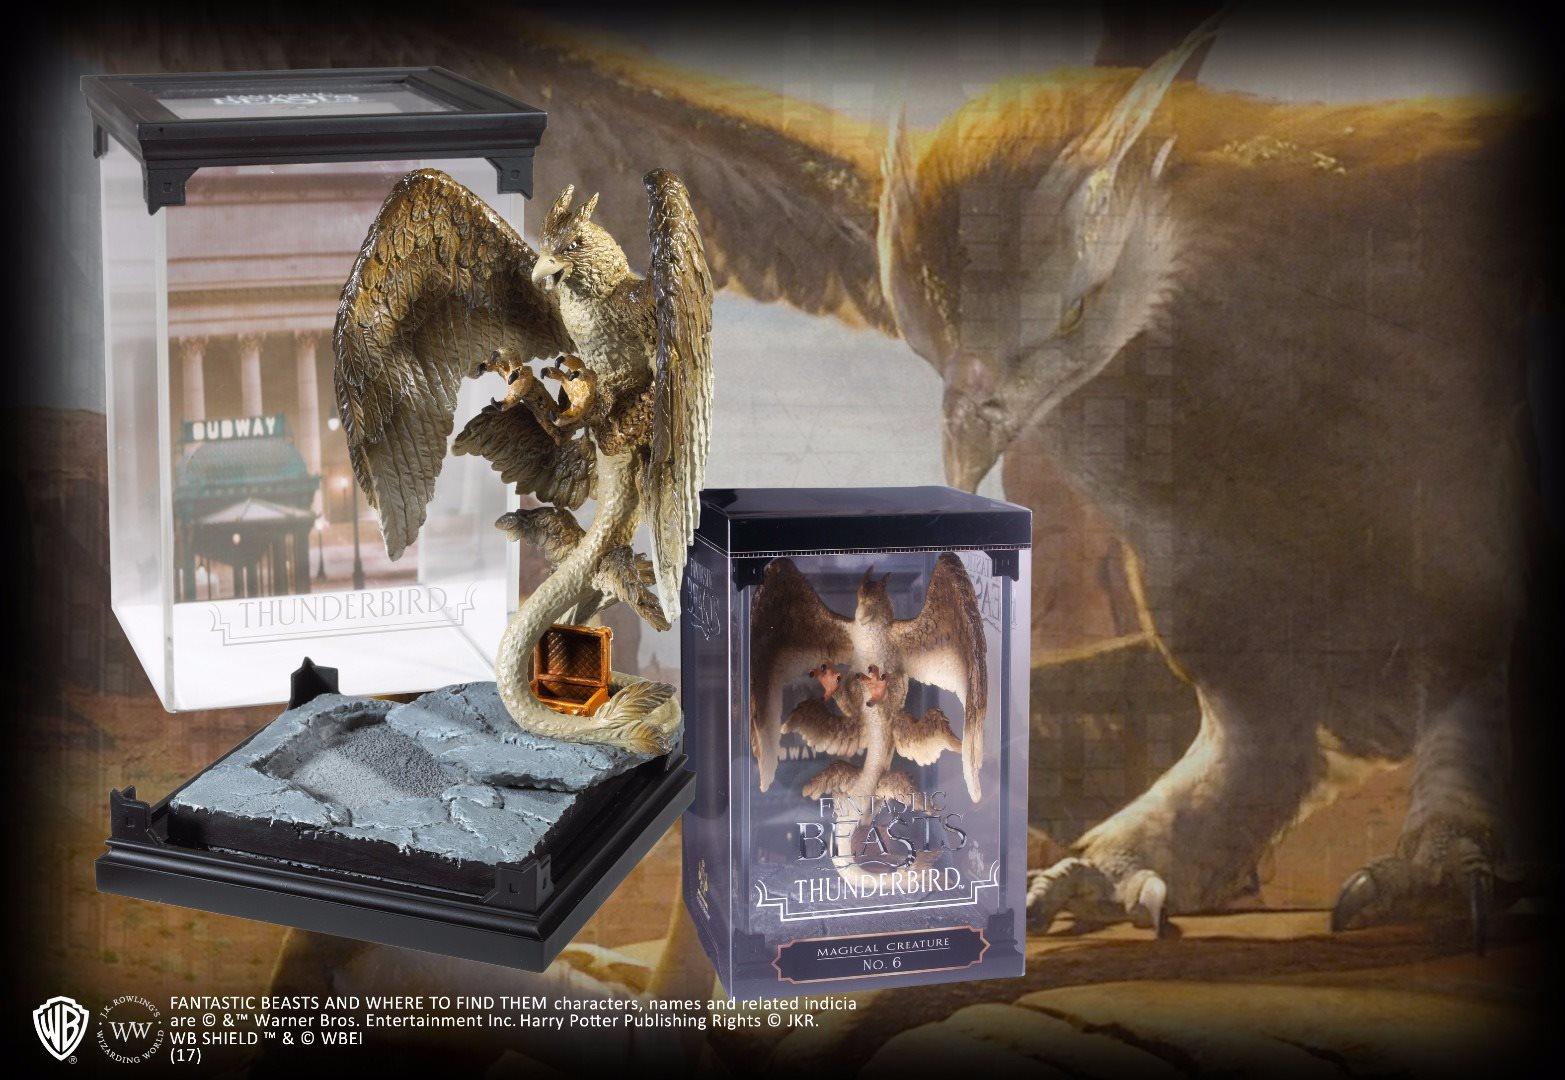 Fantastic Beasts Magical Creatures No.6 Thunderbird